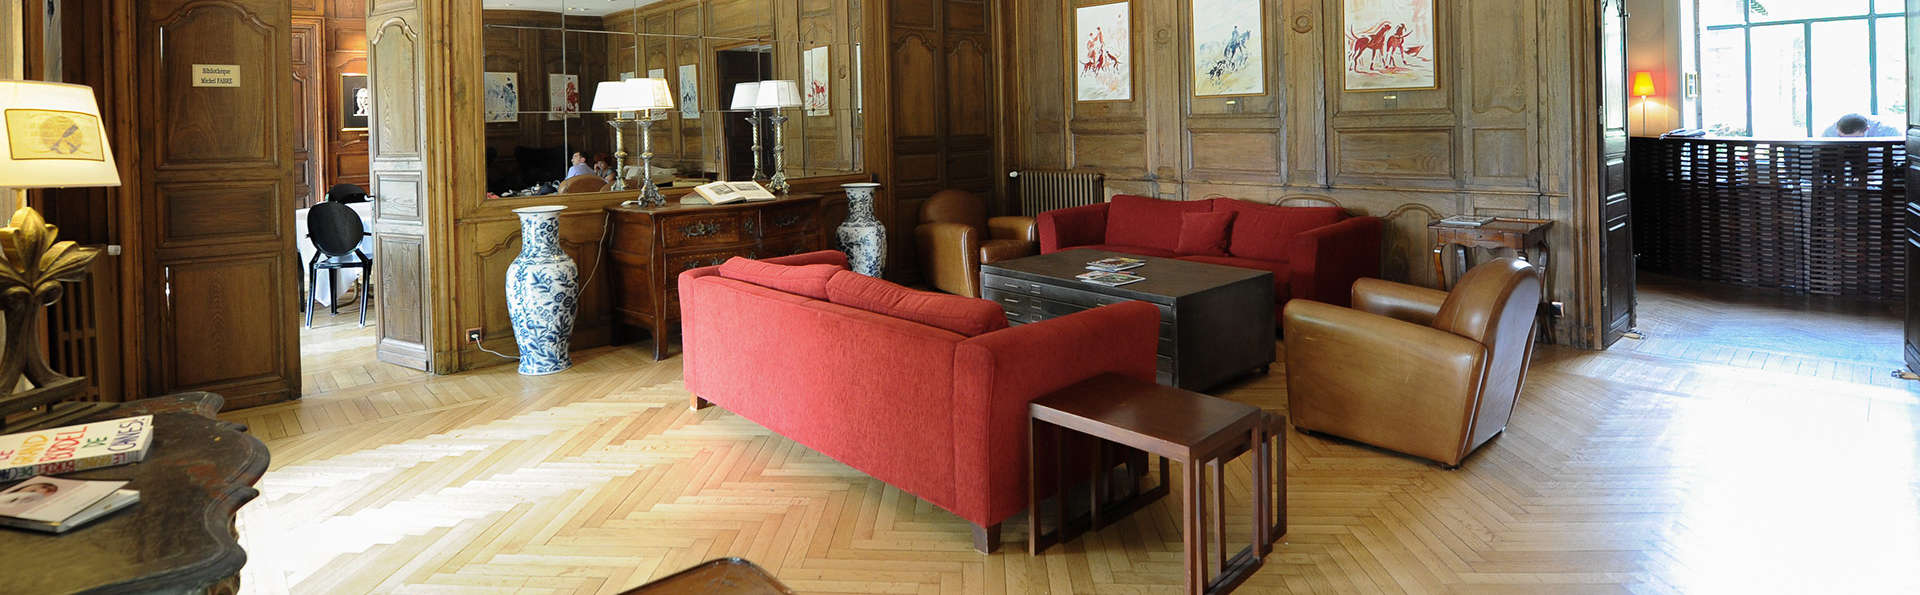 Hôtel Villa Navarre - EDIT_salon2.jpg